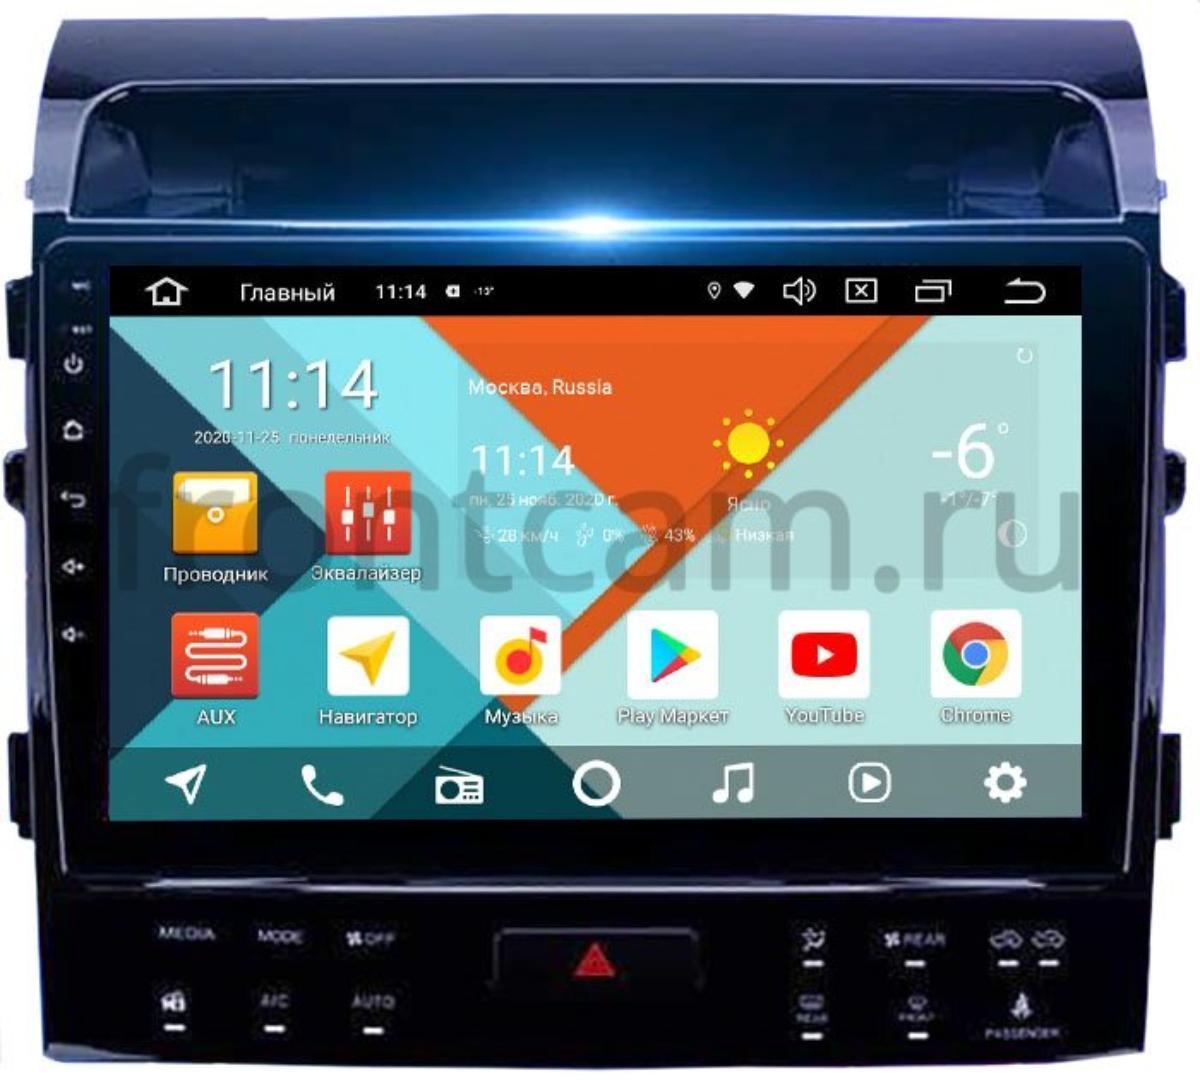 Штатная магнитола Toyota LC 200 2007-2015 (для авто с JBL и 360) Wide Media KS10-toyota-lc200-QR-3/32 DSP CarPlay 4G-SIM Android 10 (API 29) (+ Камера заднего вида в подарок!)